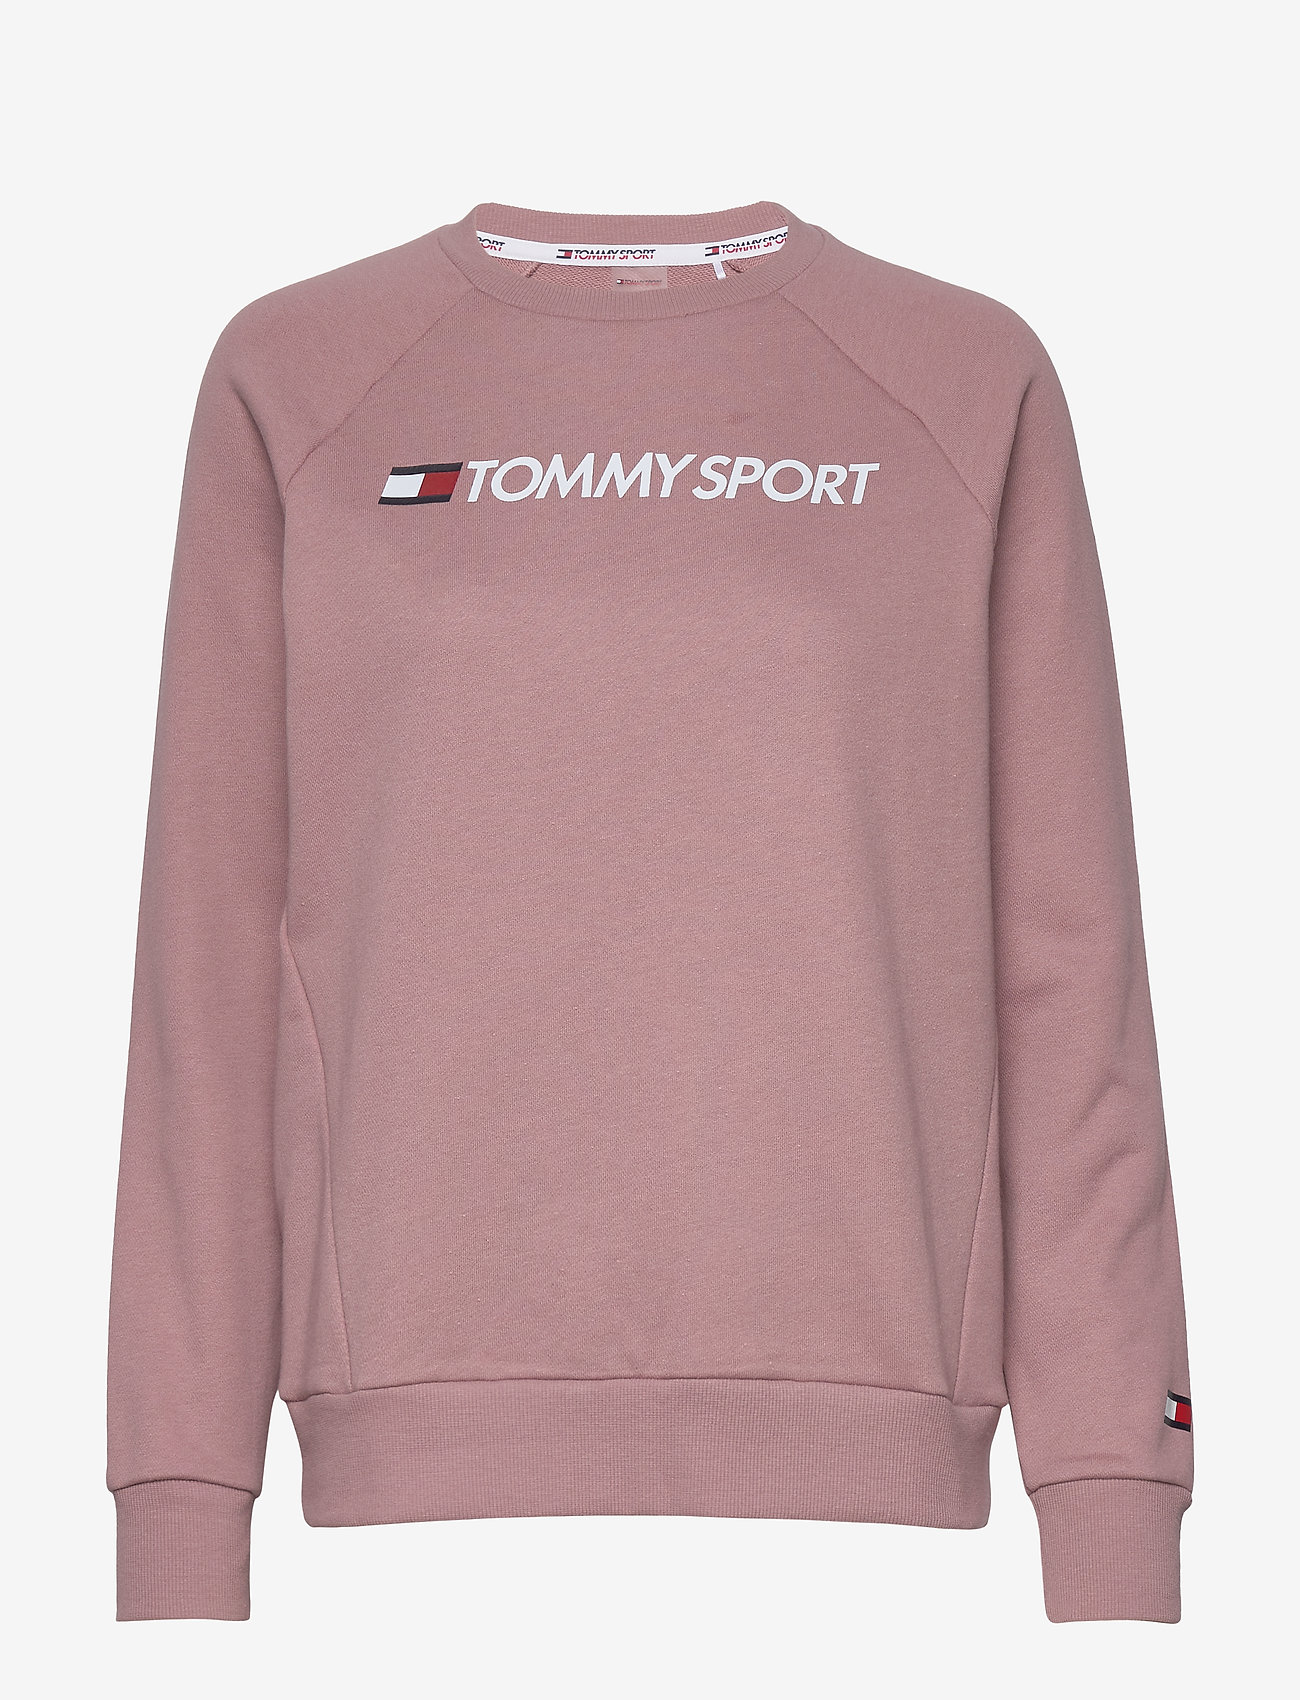 Tommy Sport - CREW SWEATER LOGO - sweatshirts - red dust - 0